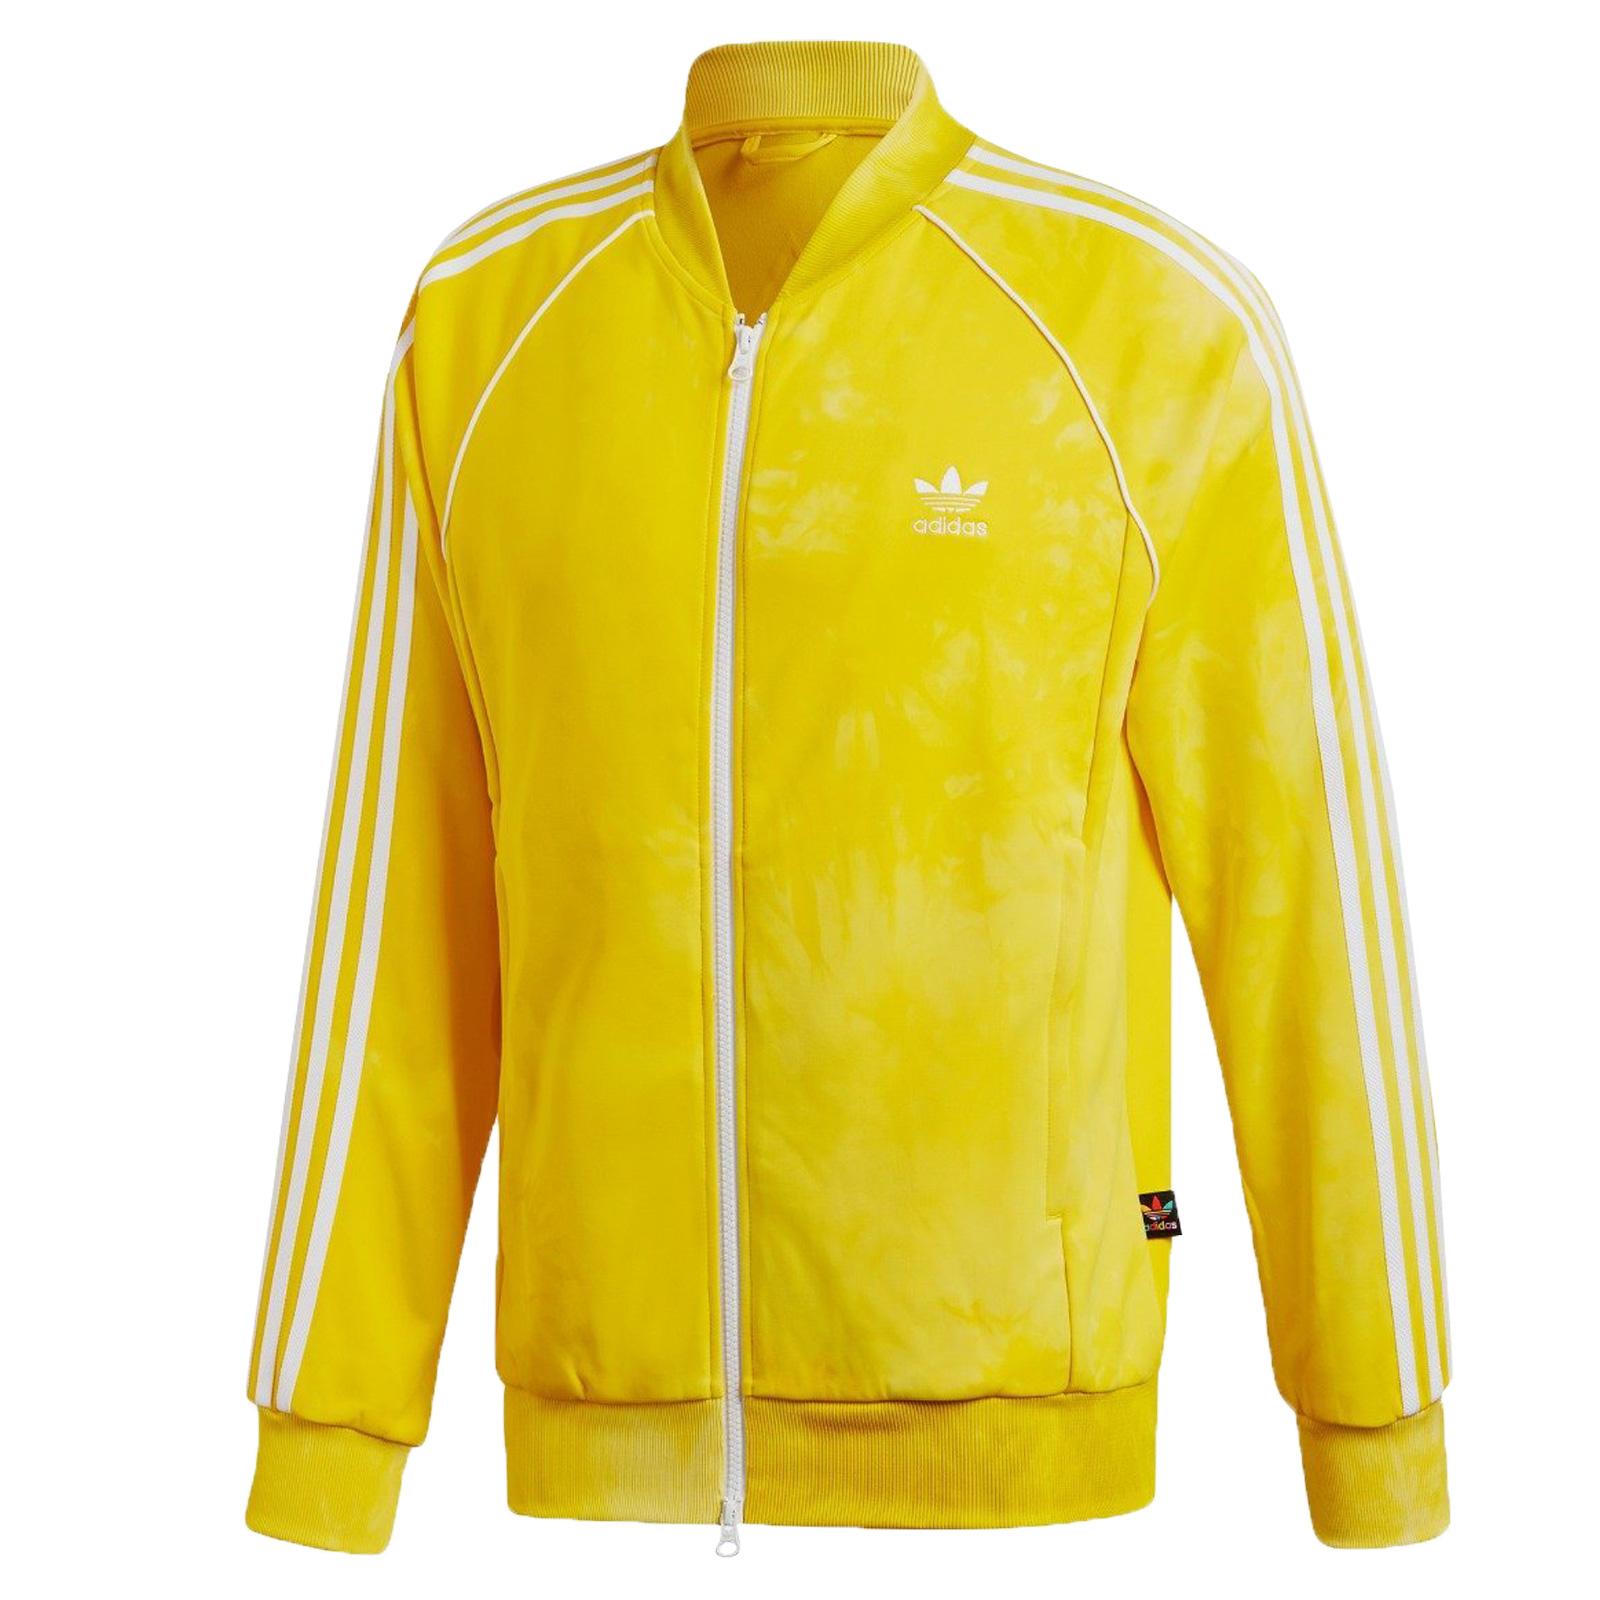 adidas pharrell williams jacke gelb